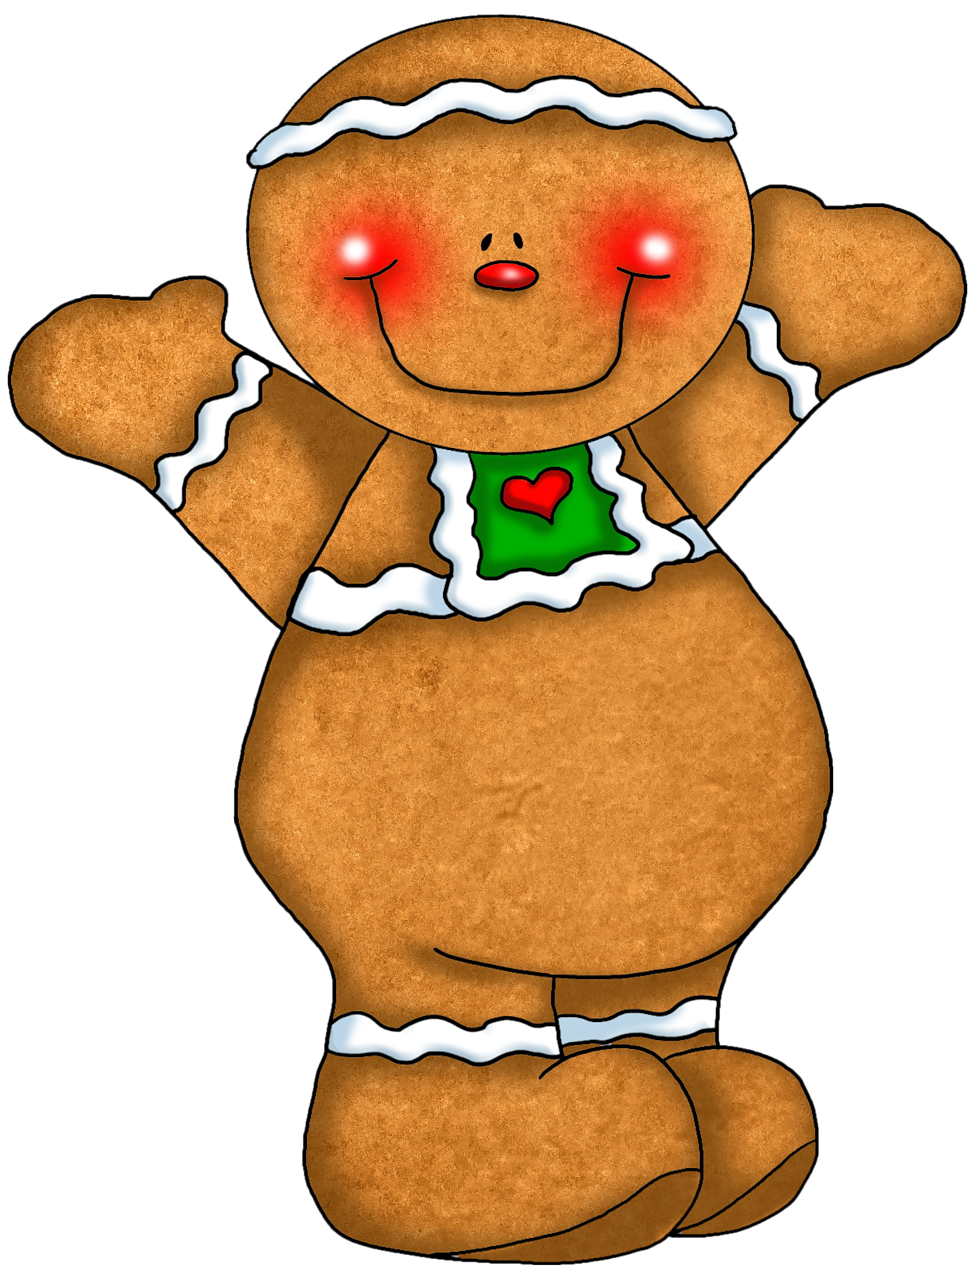 975x1280 Merry Christmas Ginger Couple Sl